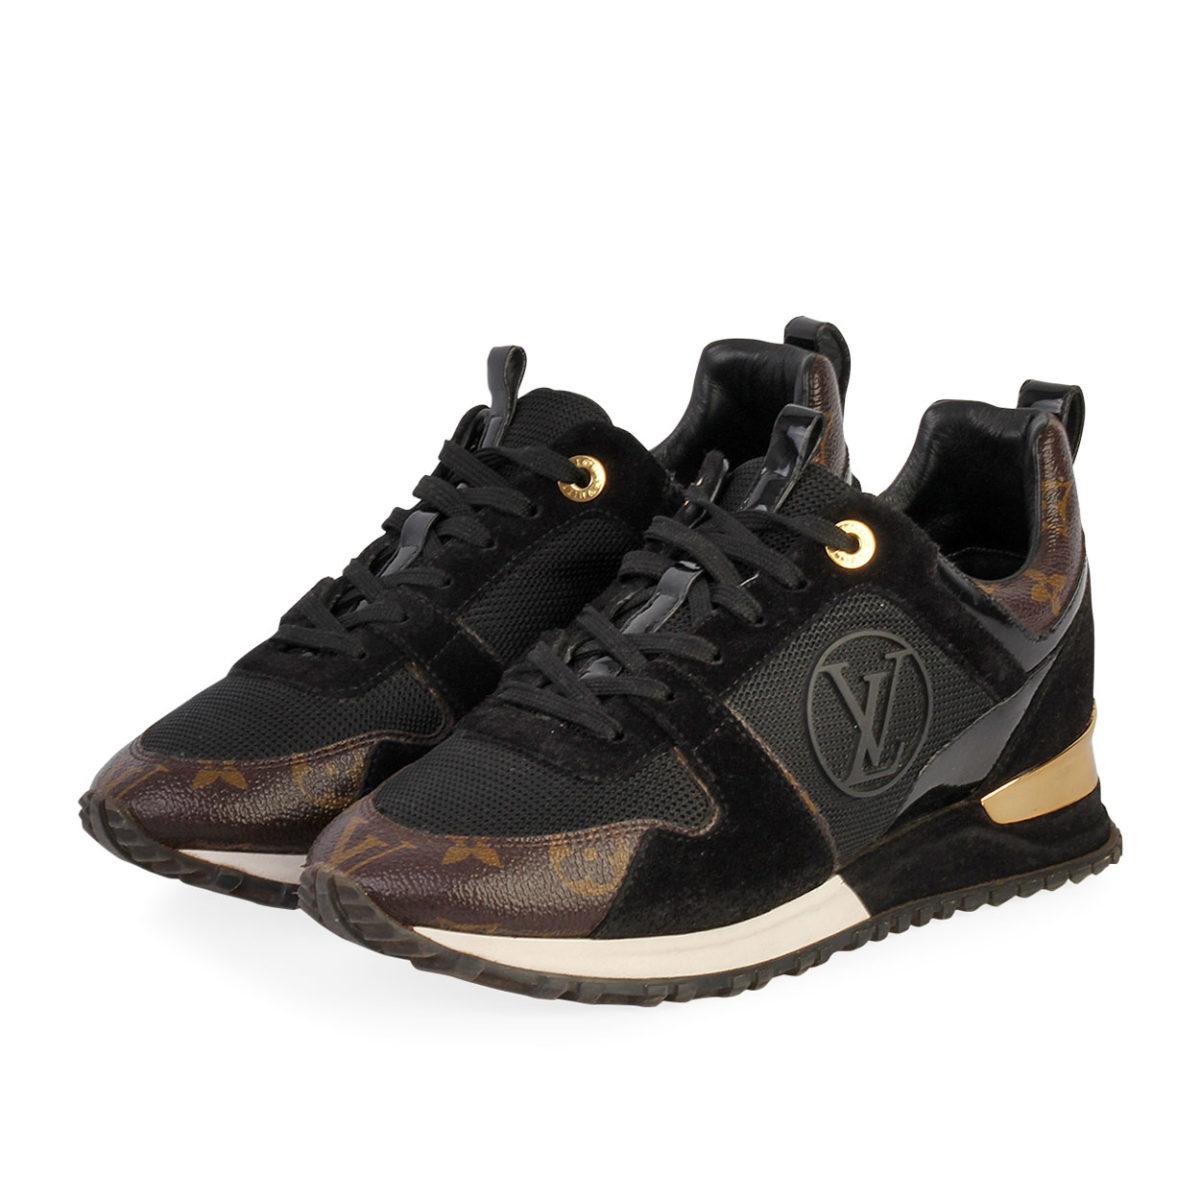 b76f03e6 LOUIS VUITTON Monogram Run Away Sneakers Black - S: 38 (5)